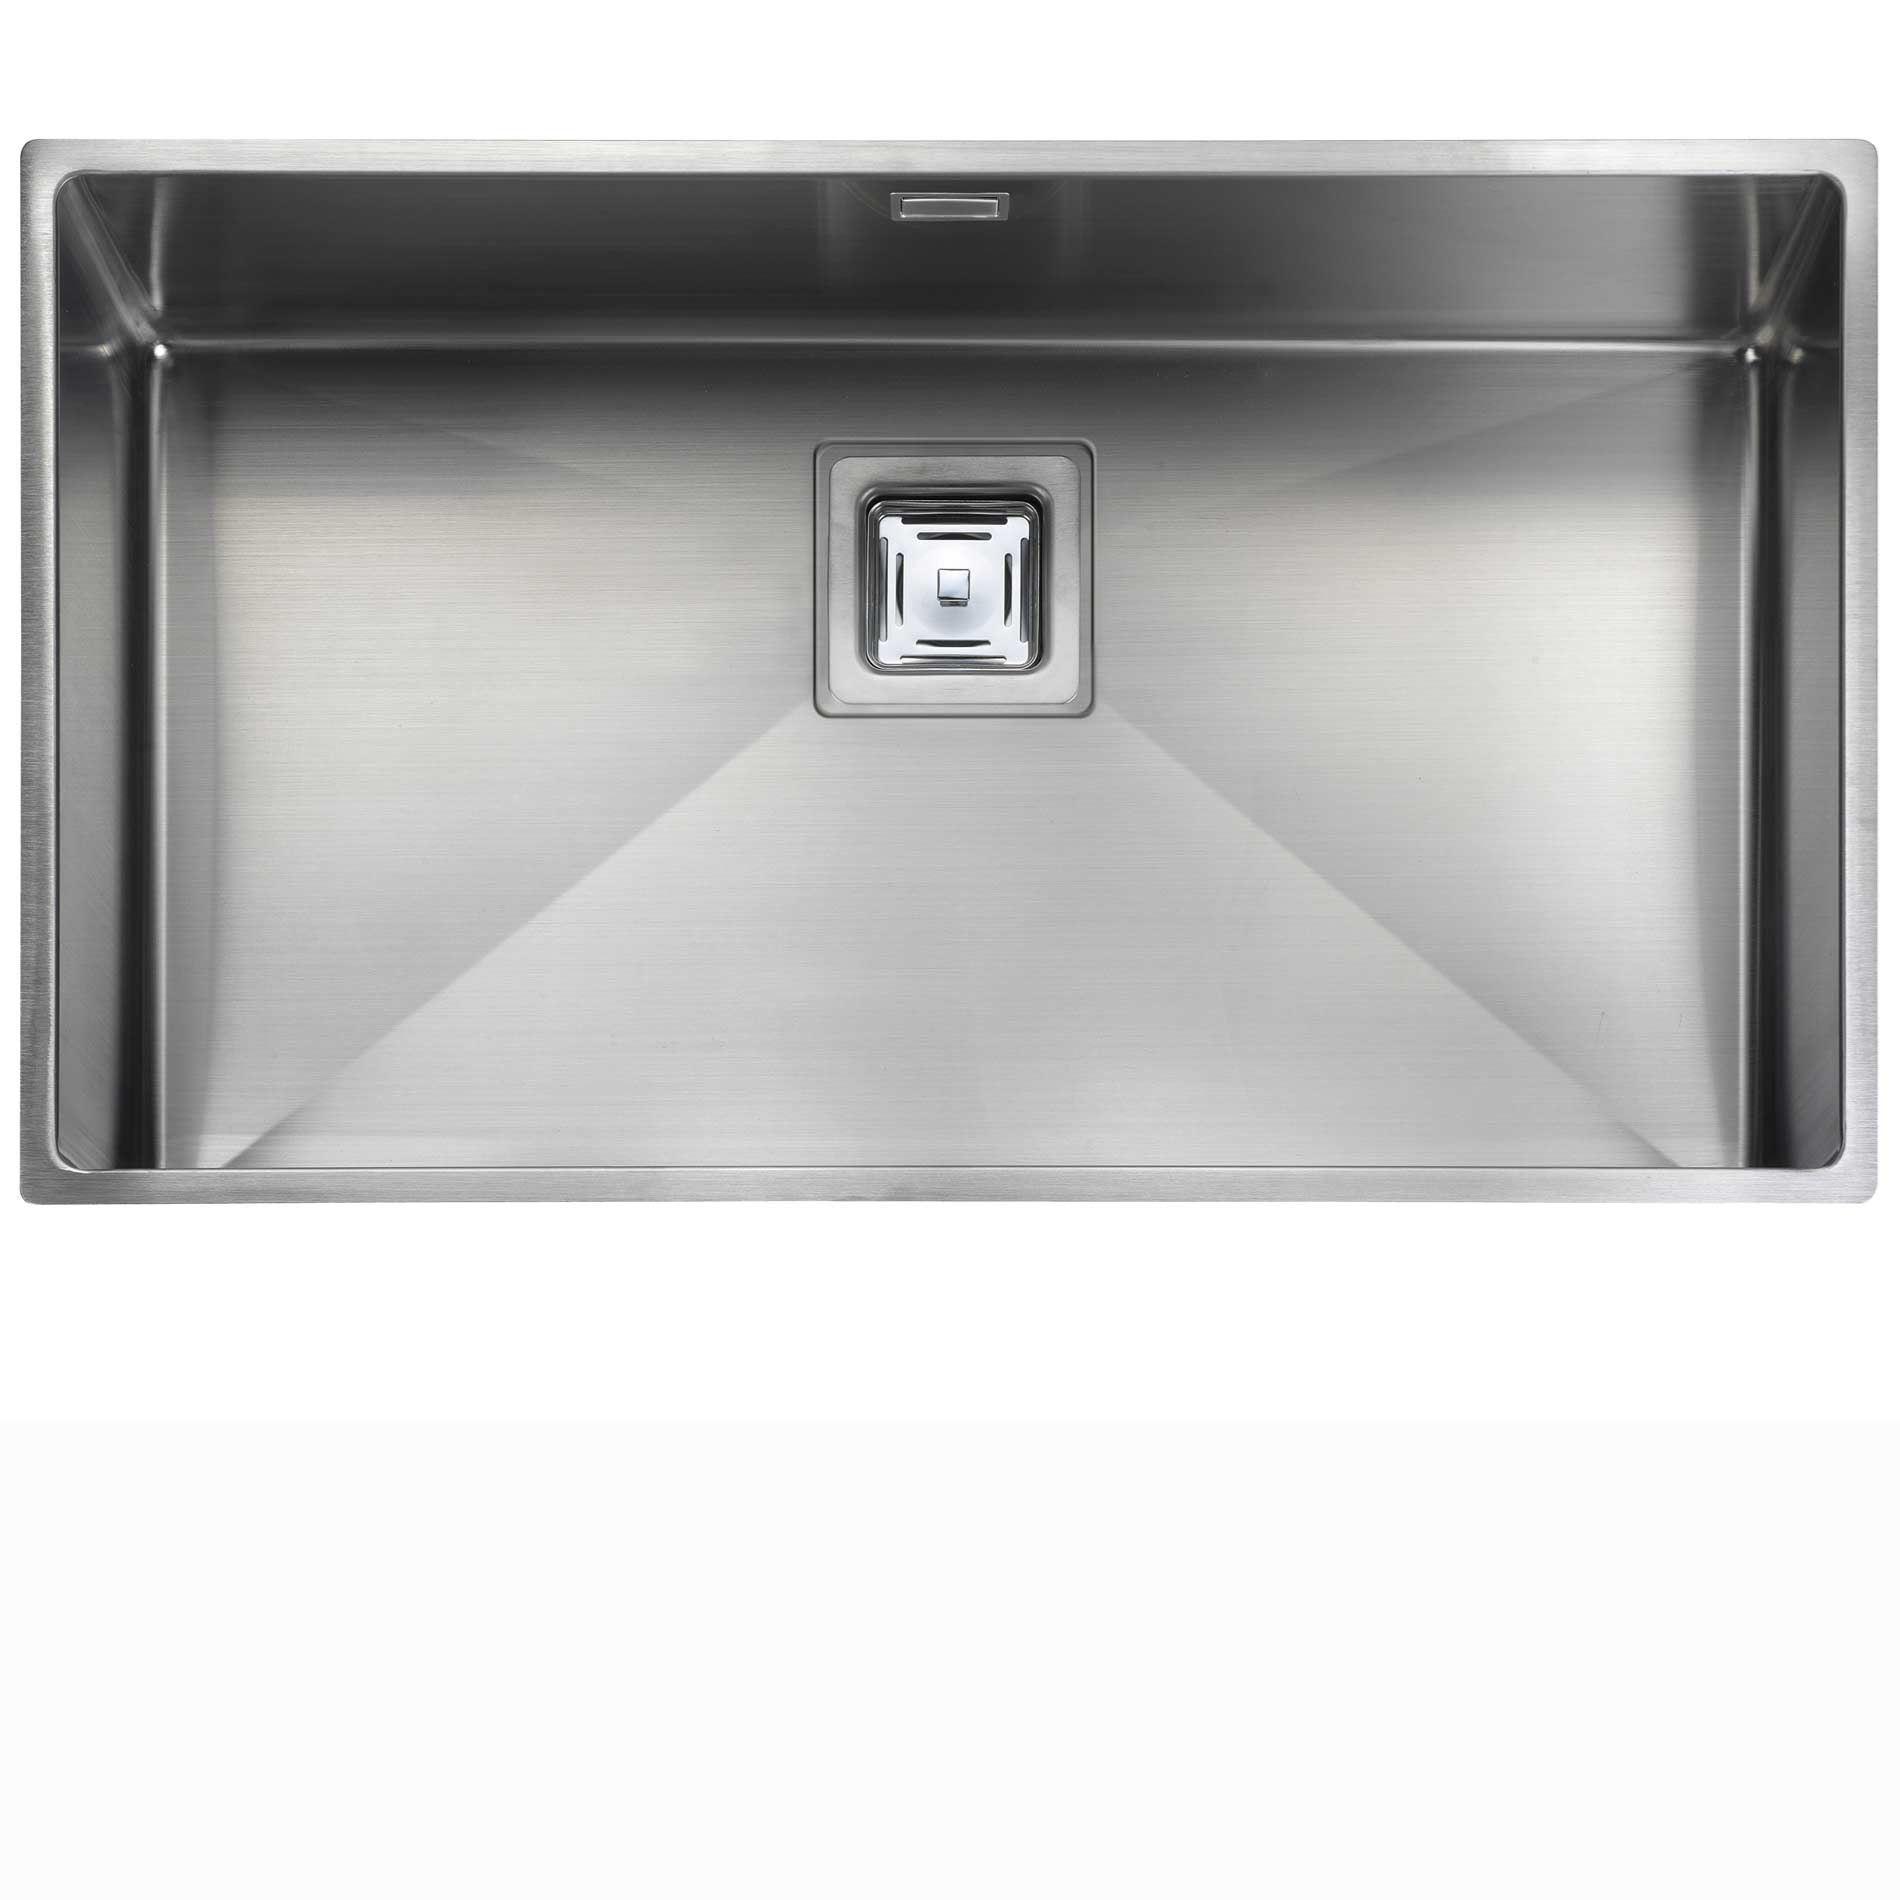 Rangemaster atlantic kube kub70 stainless steel sink for The kitchen sink company